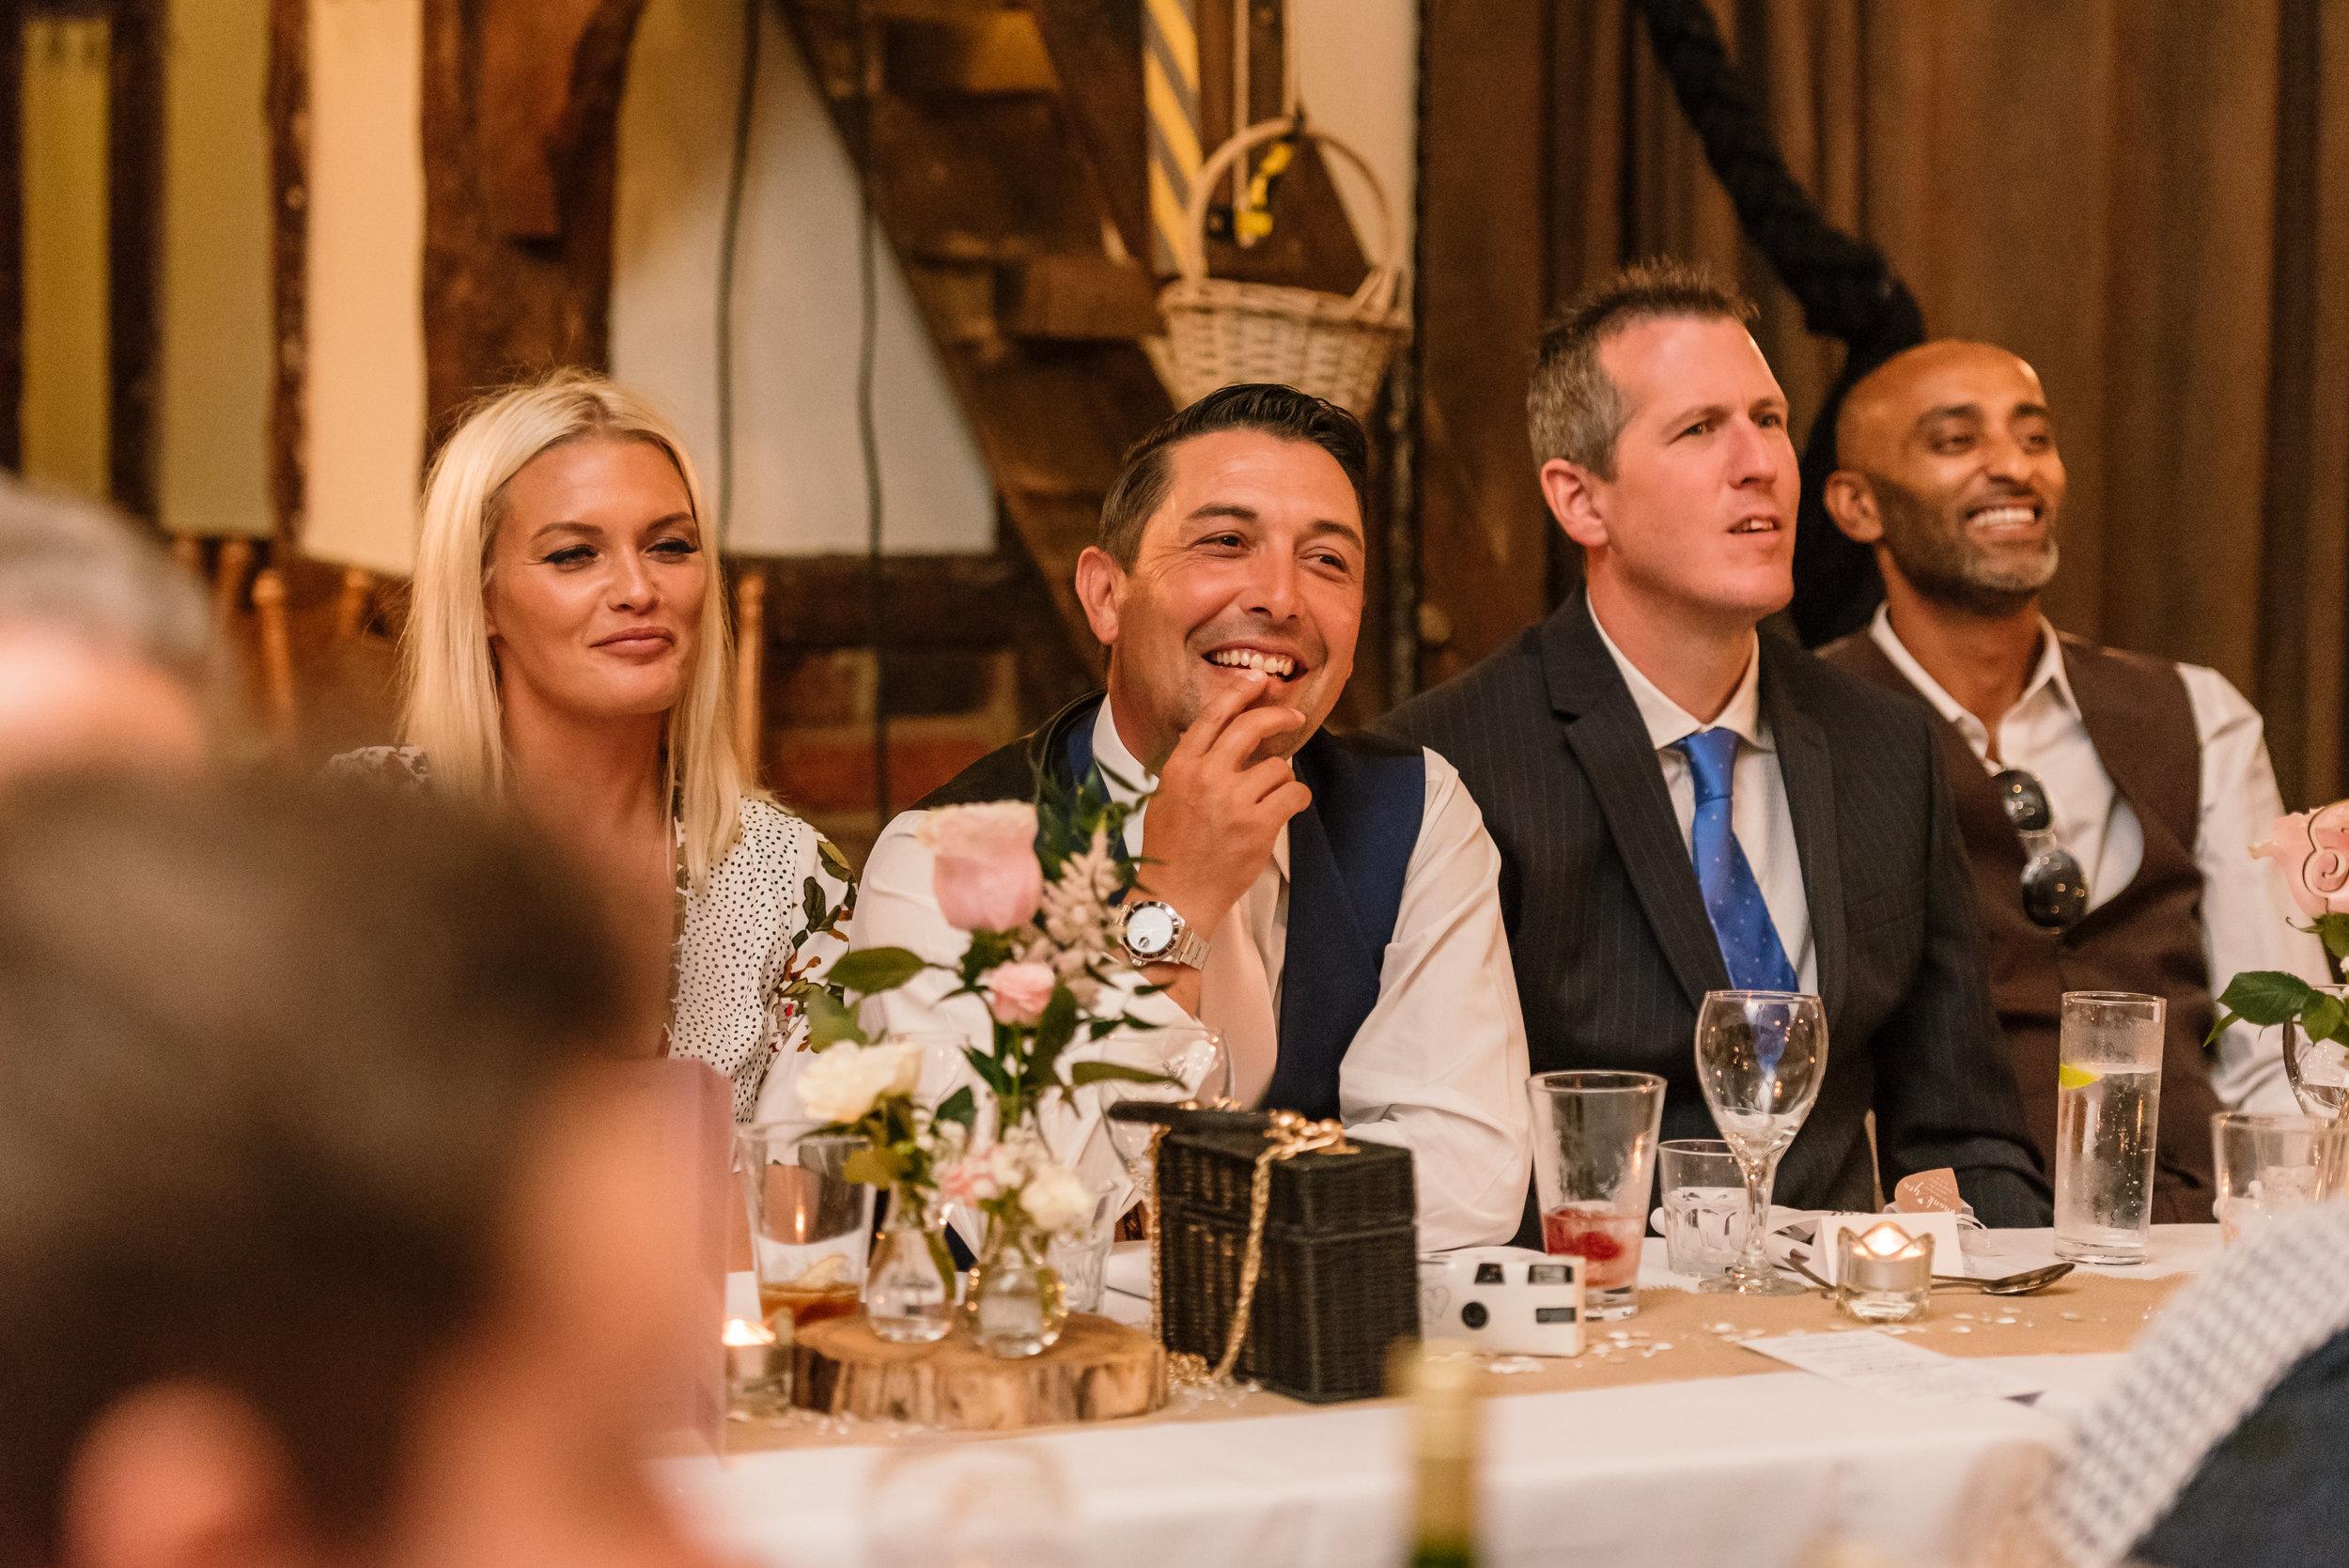 Sarah-Fishlock-Photography : Hampshire-wedding-photographer-hampshire : fleet-wedding-photographer-fleet : Meade-Hall-Wedding-Photographer : Meade-Hall-Wedding-Photos-869.jpg